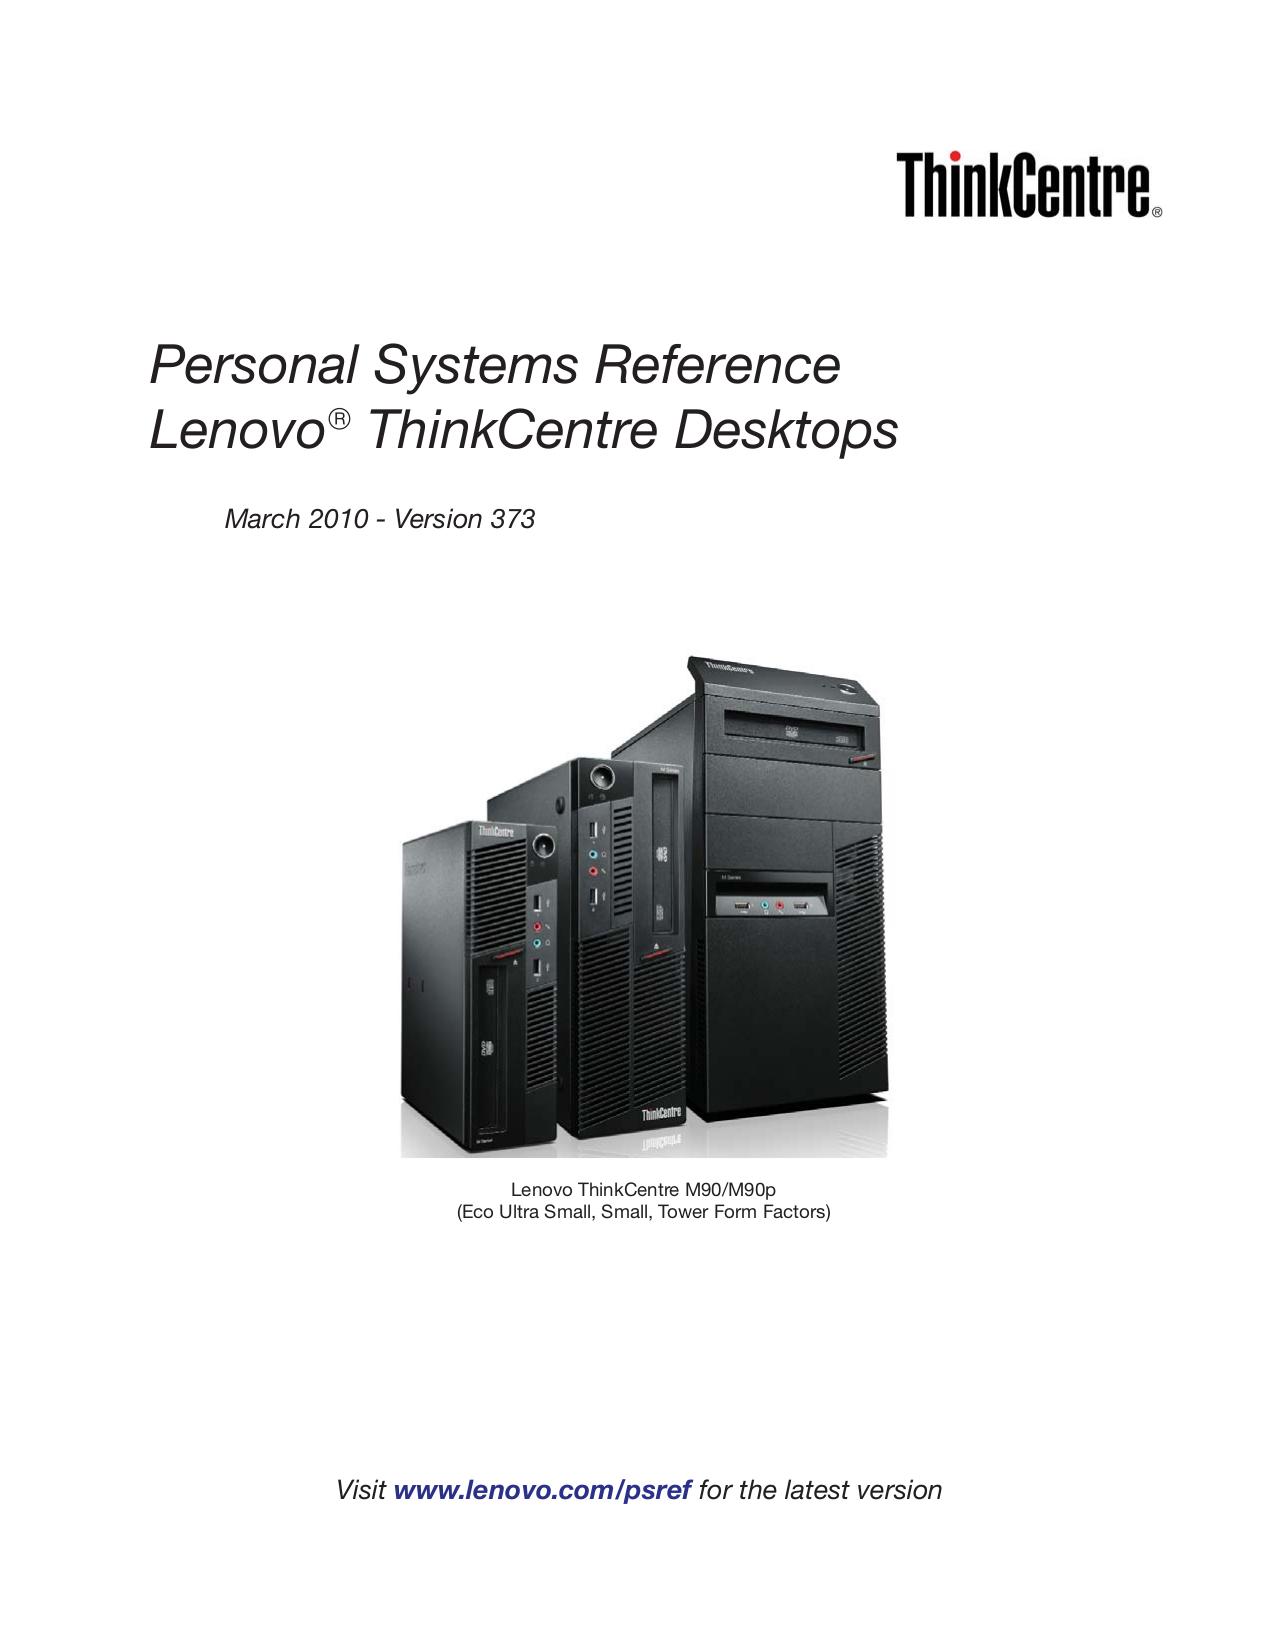 pdf for Lenovo Desktop ThinkCentre M90 5485 manual